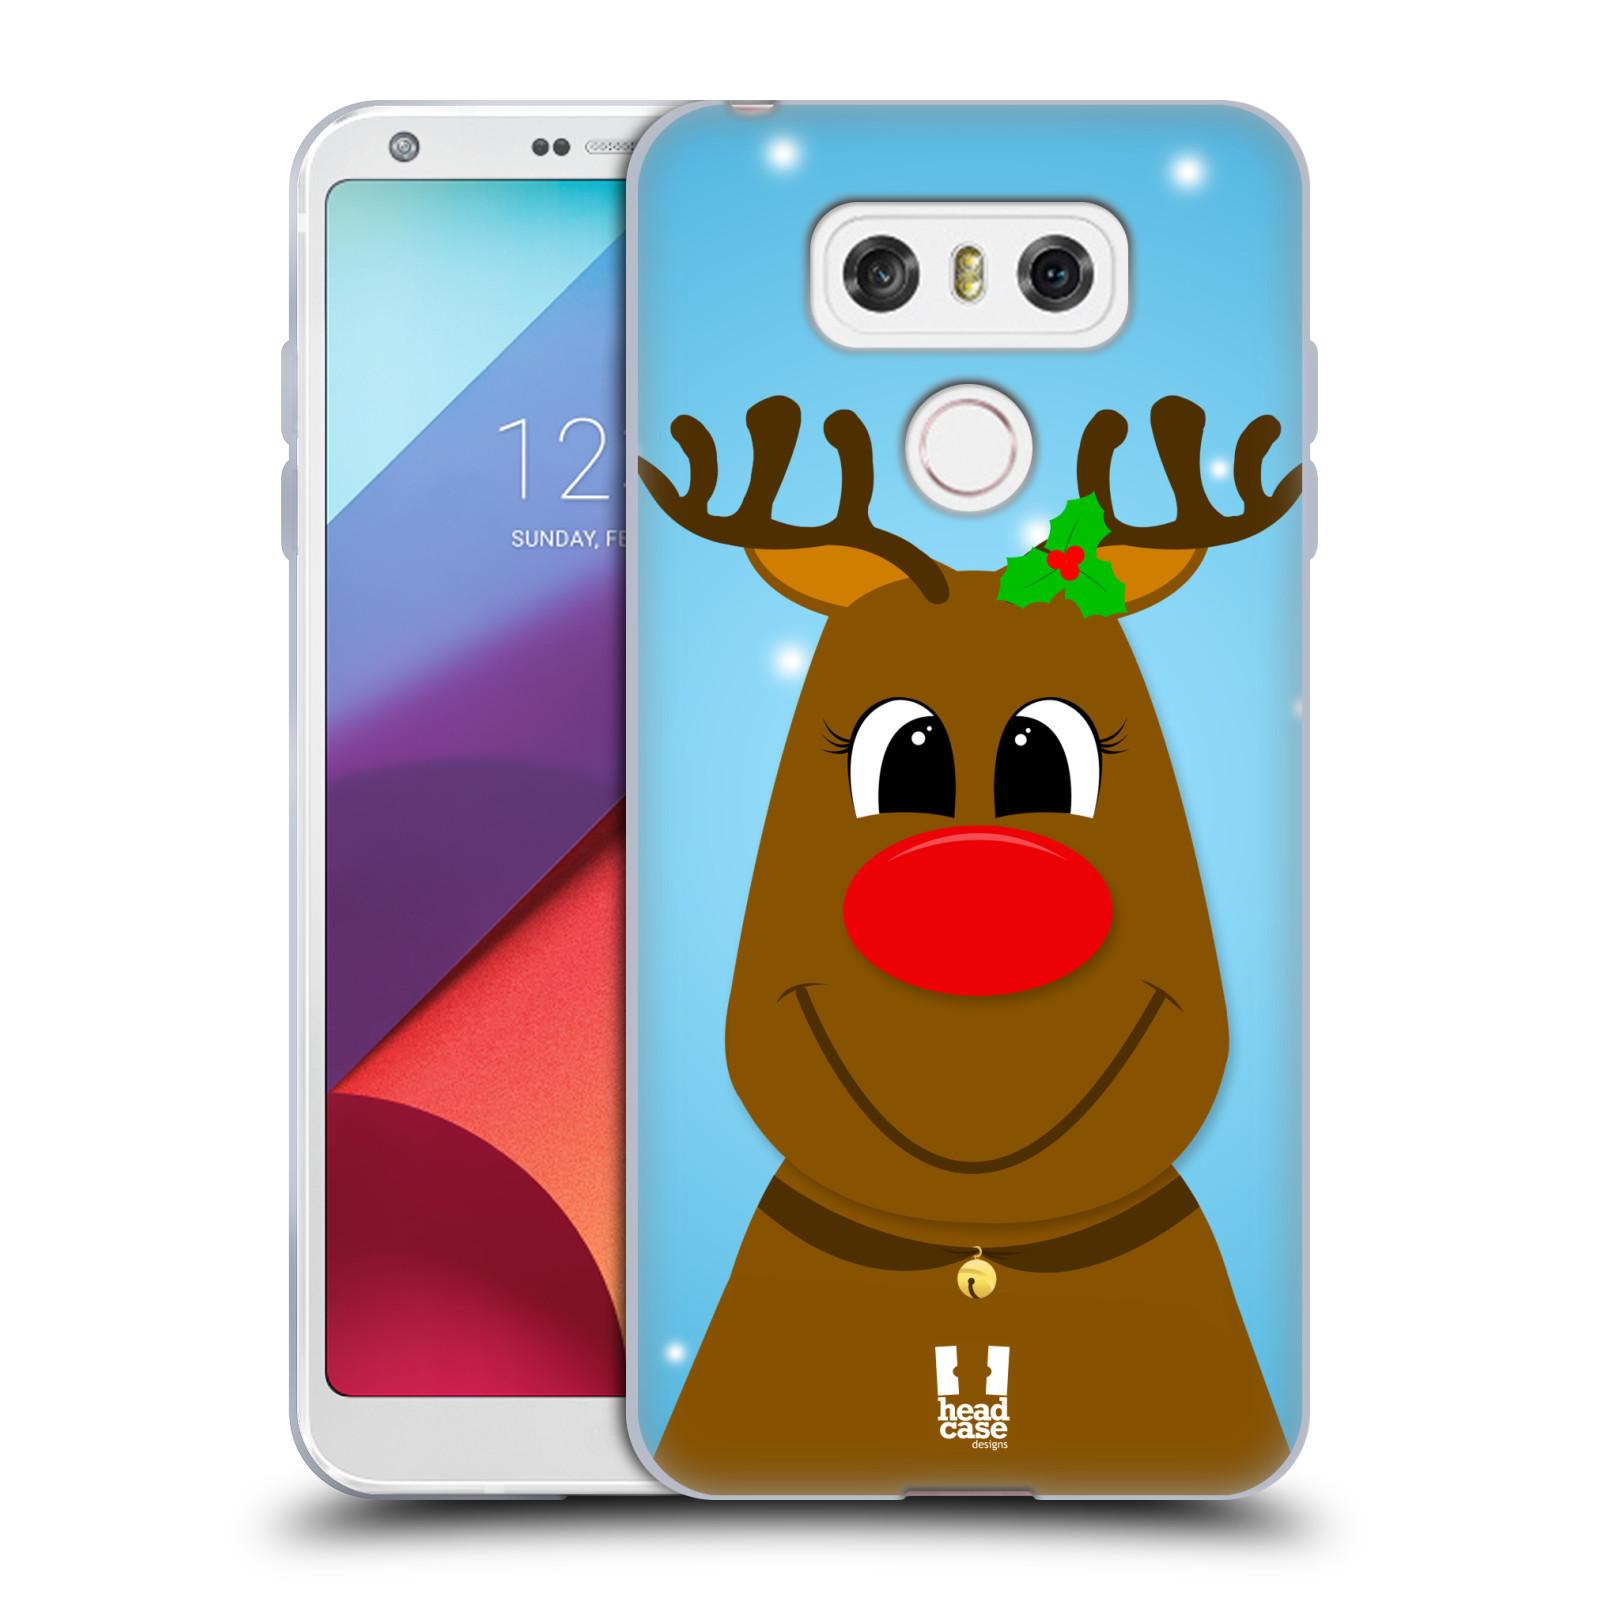 Silikonové pouzdro na mobil LG G6 - Head Case VÁNOCE RUDOLF SOB (Silikonový kryt či obal na mobilní telefon LG G6 H870 / LG G6 Dual SIM H870DS)